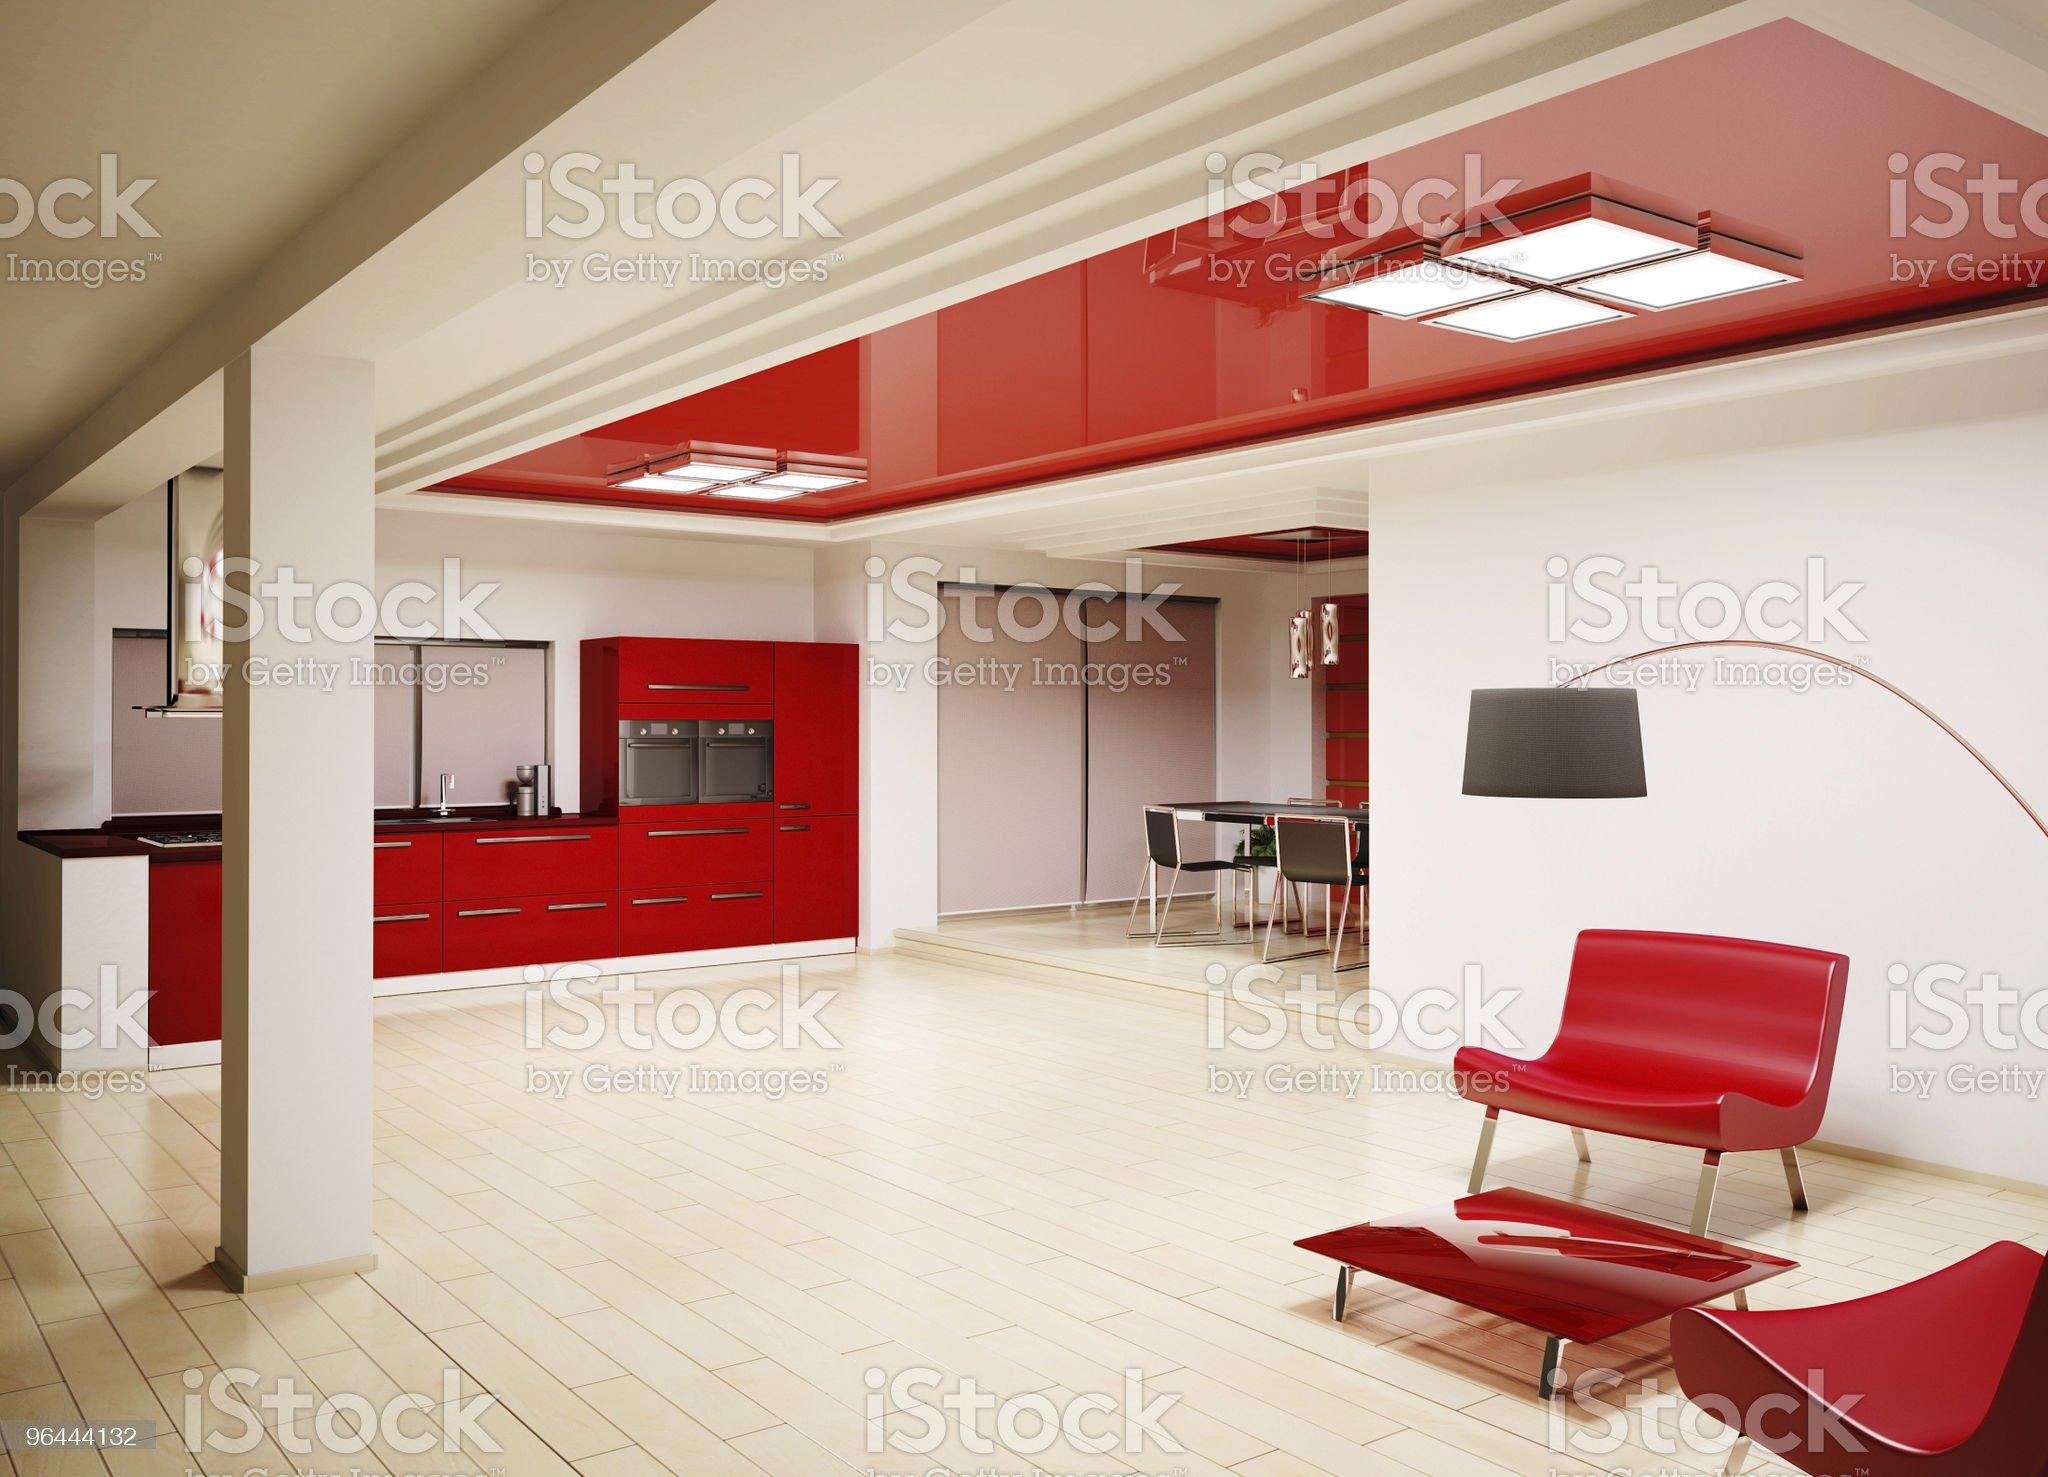 Interior of modern kitchen 3d render royalty-free stock vector art